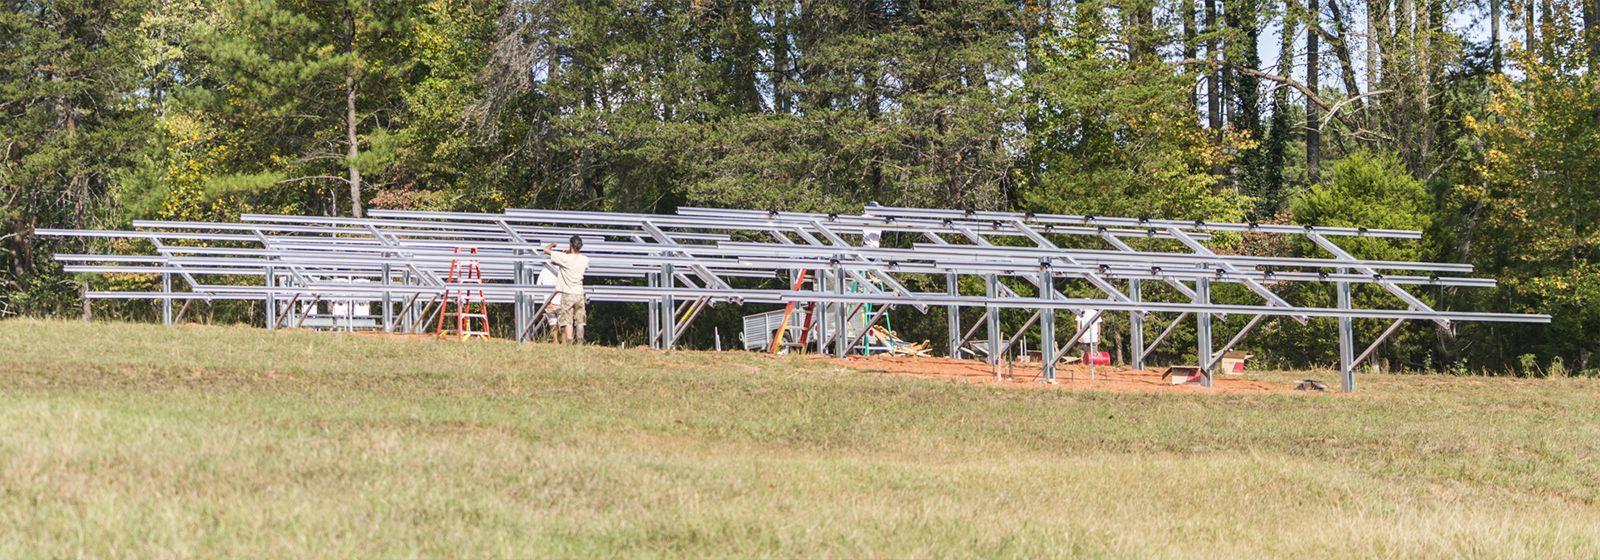 Rebates drive success of SC solar program